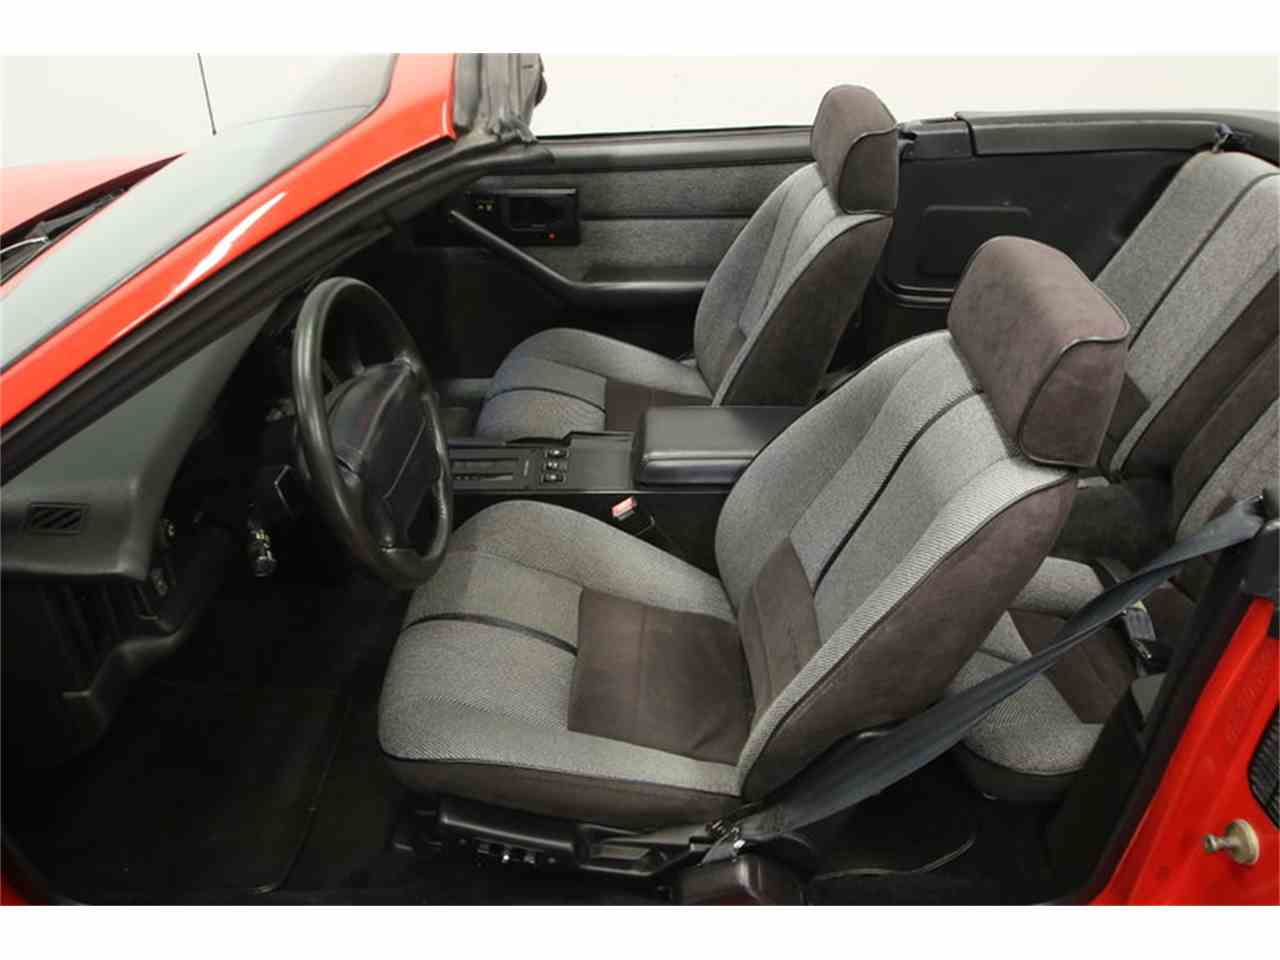 Camaro 1990 chevrolet camaro iroc z for sale : 1990 Chevrolet Camaro IROC Z/28 Convertible for Sale | ClassicCars ...